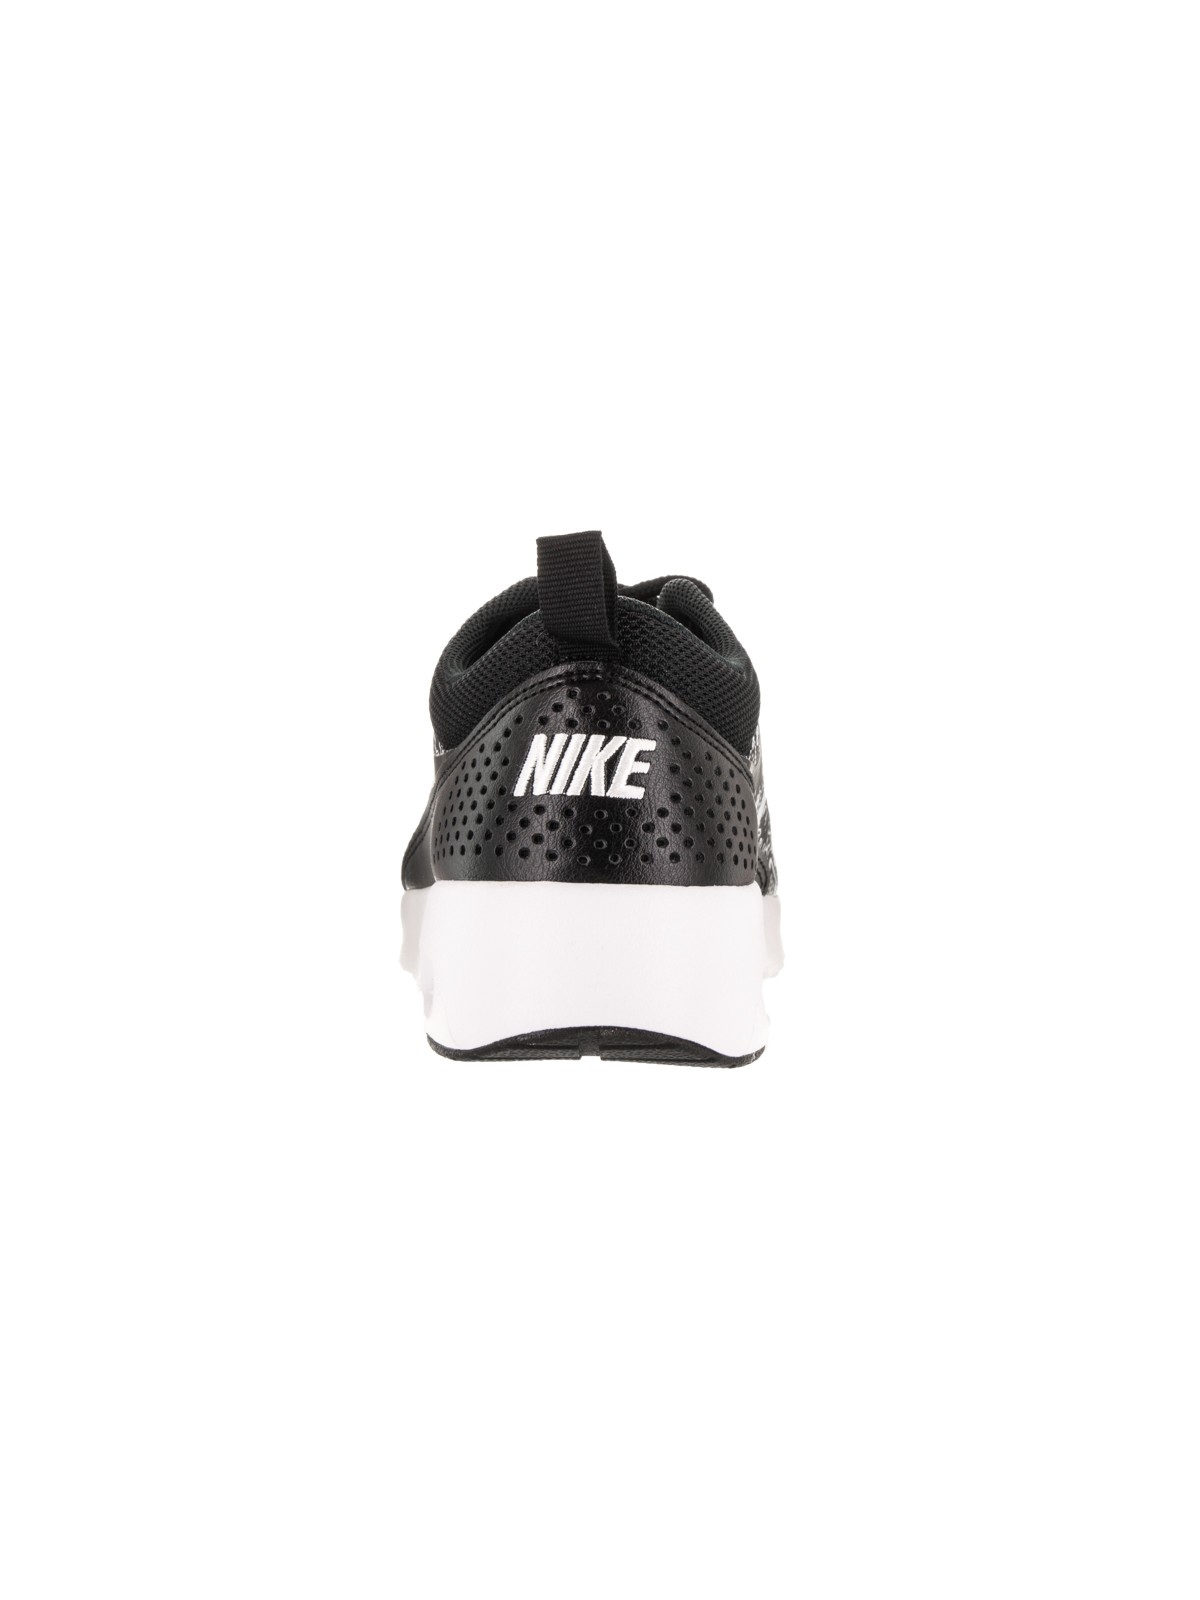 Nike Women's Air Max Thea Print Running Shoe